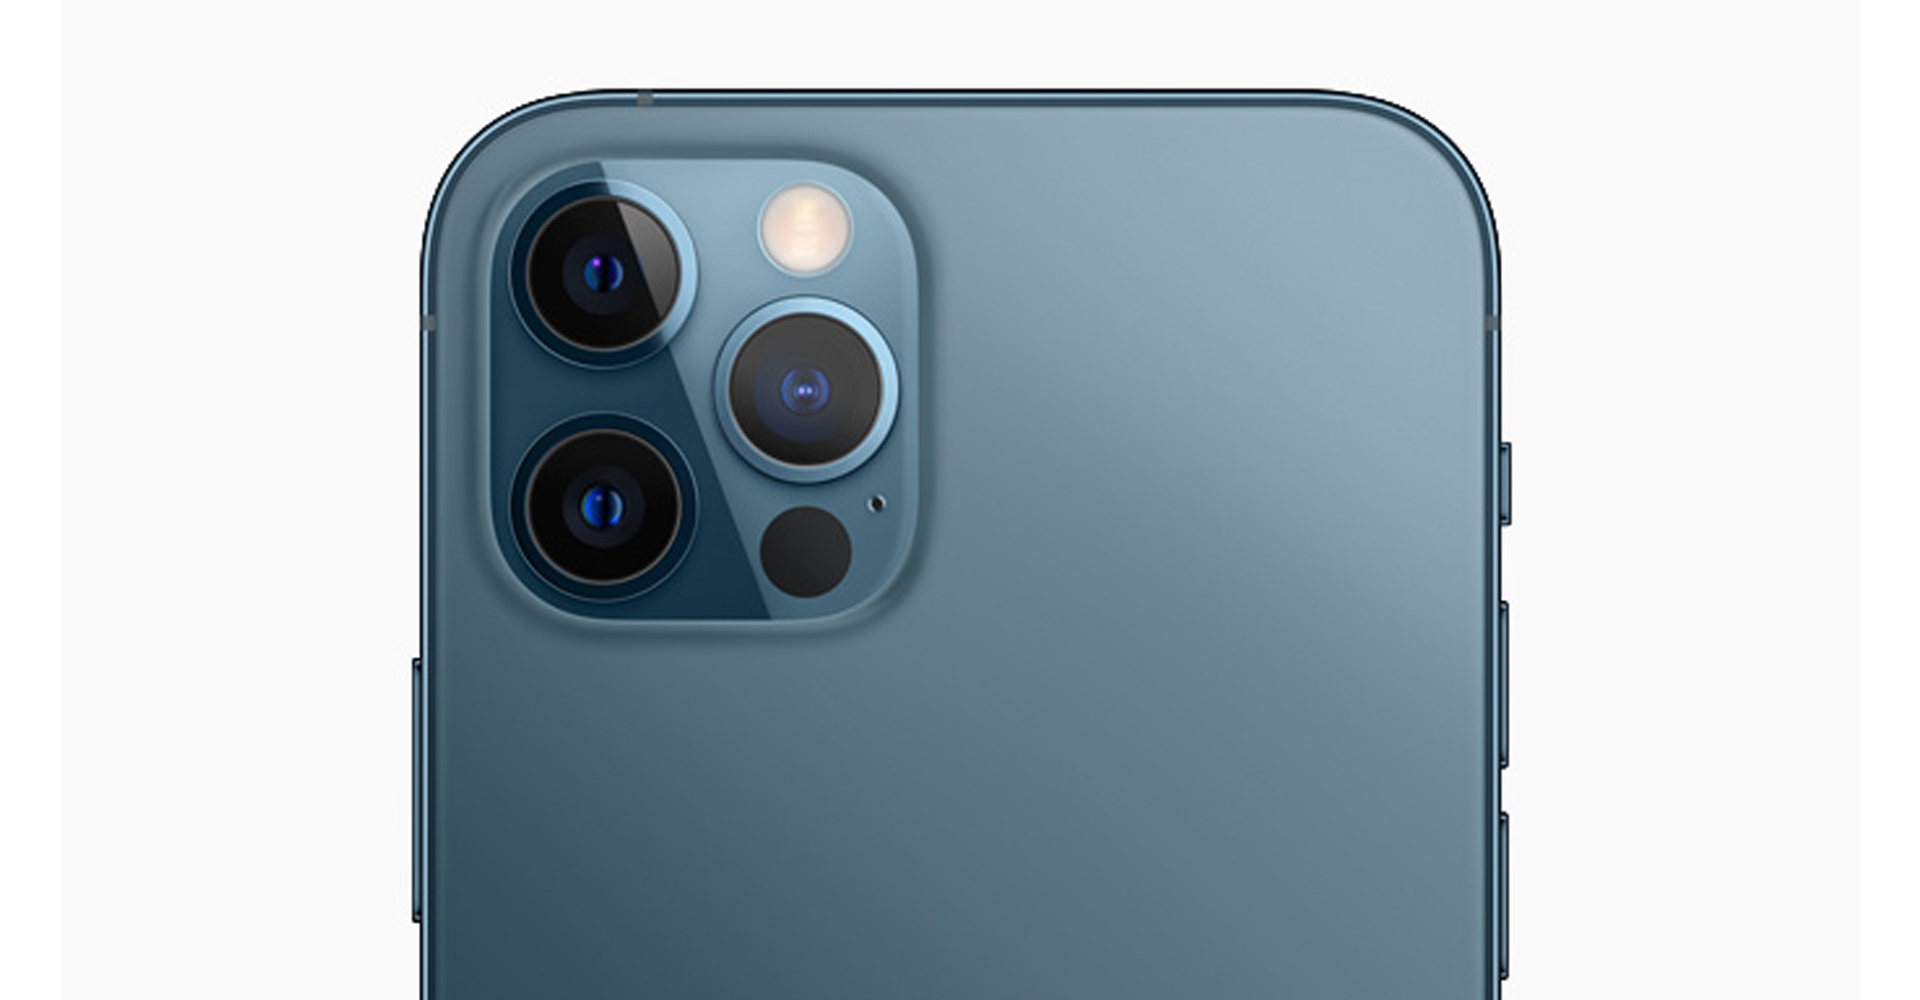 Rückseite des iPhone 12 Pro Max mit Triple-Kamera